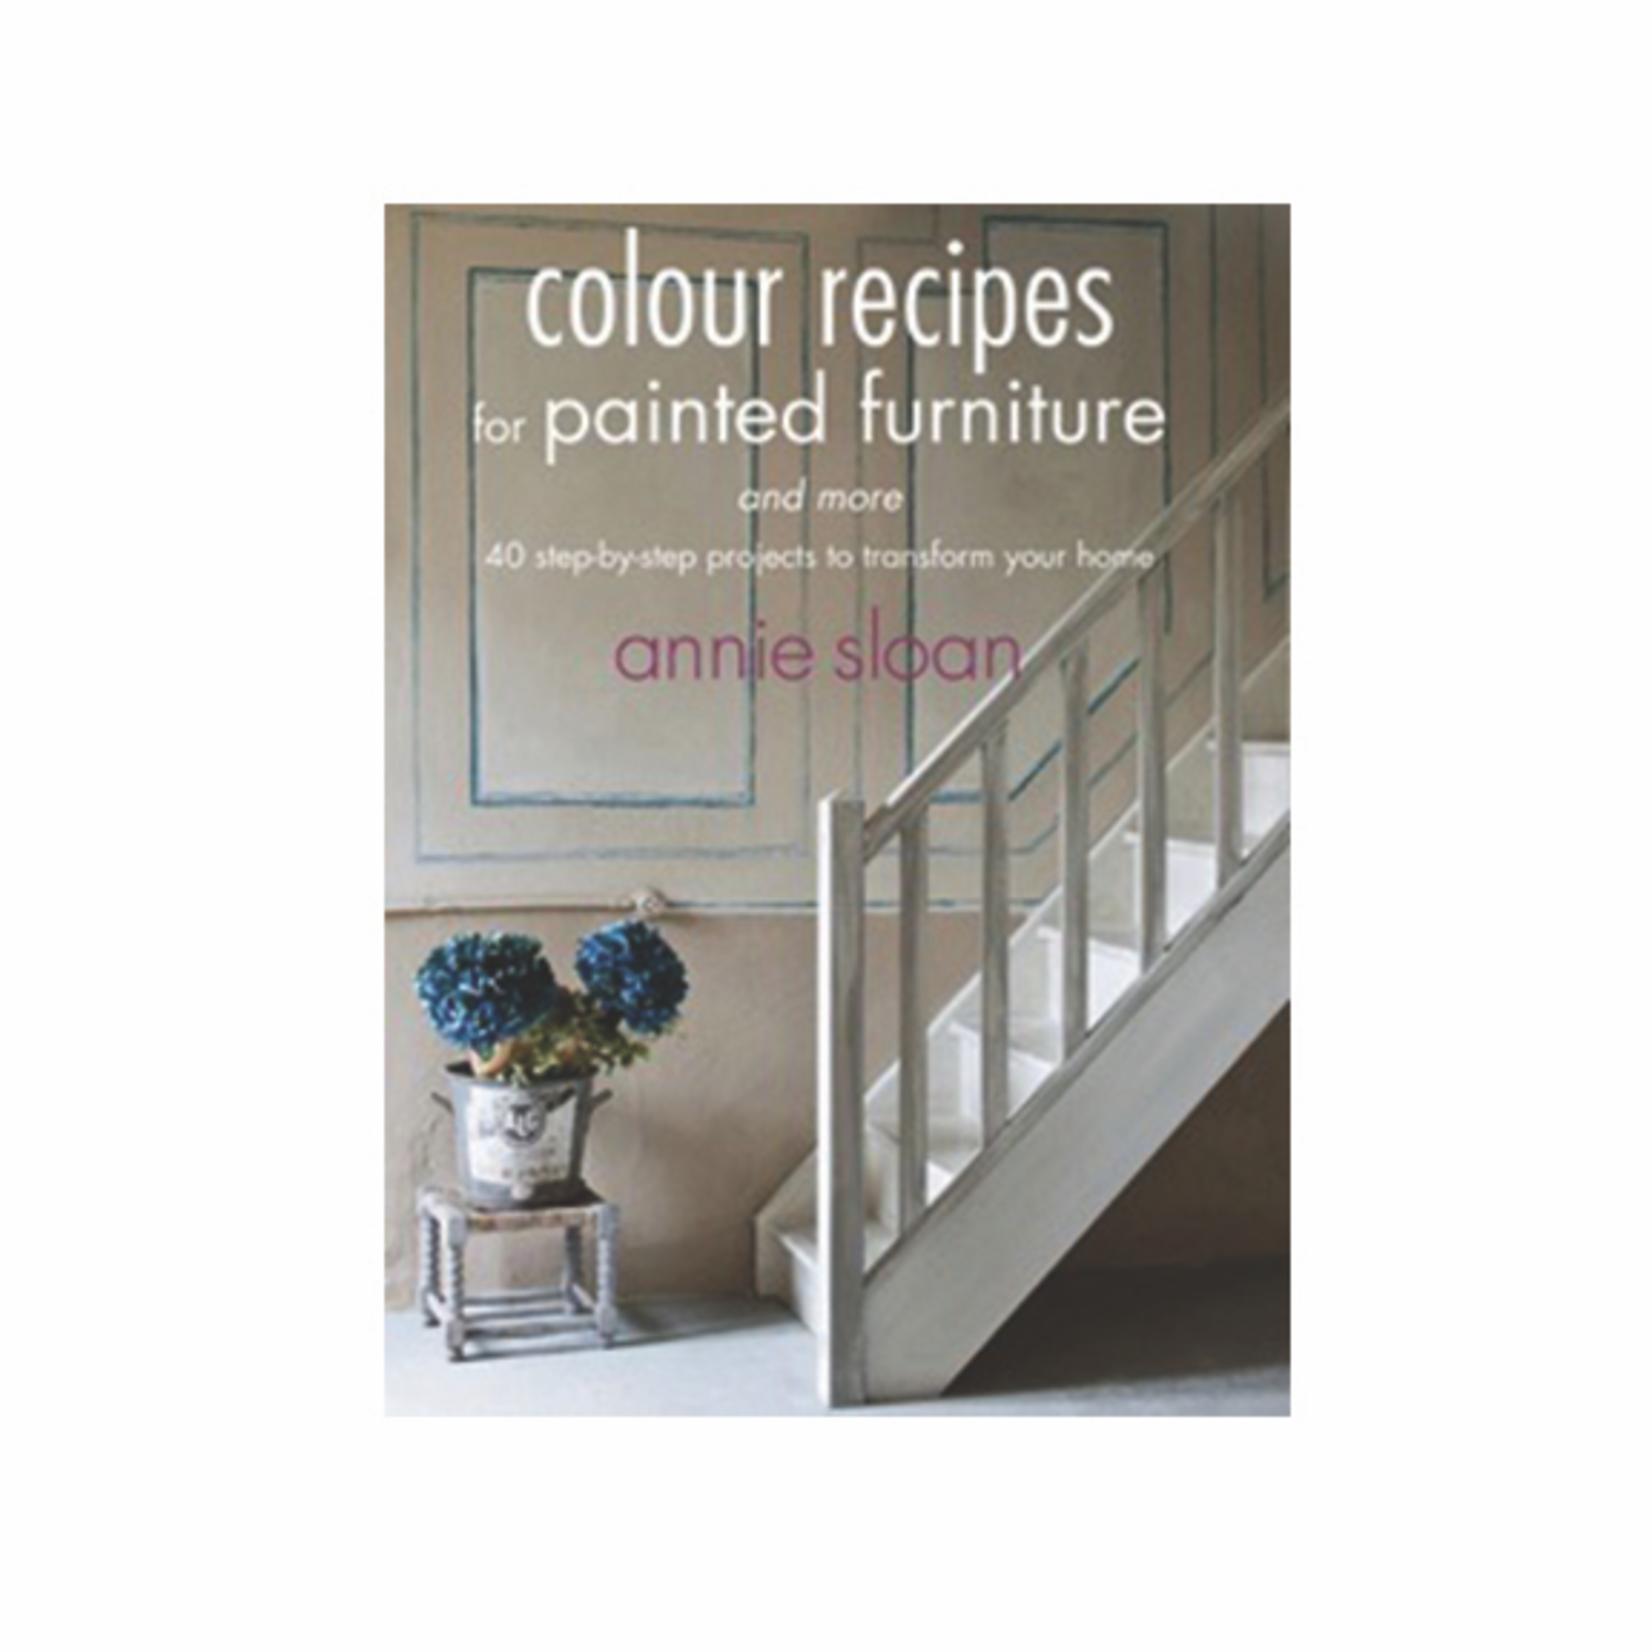 Annie Sloan Annie Sloan Colour Recipes for Painted Furniture Book